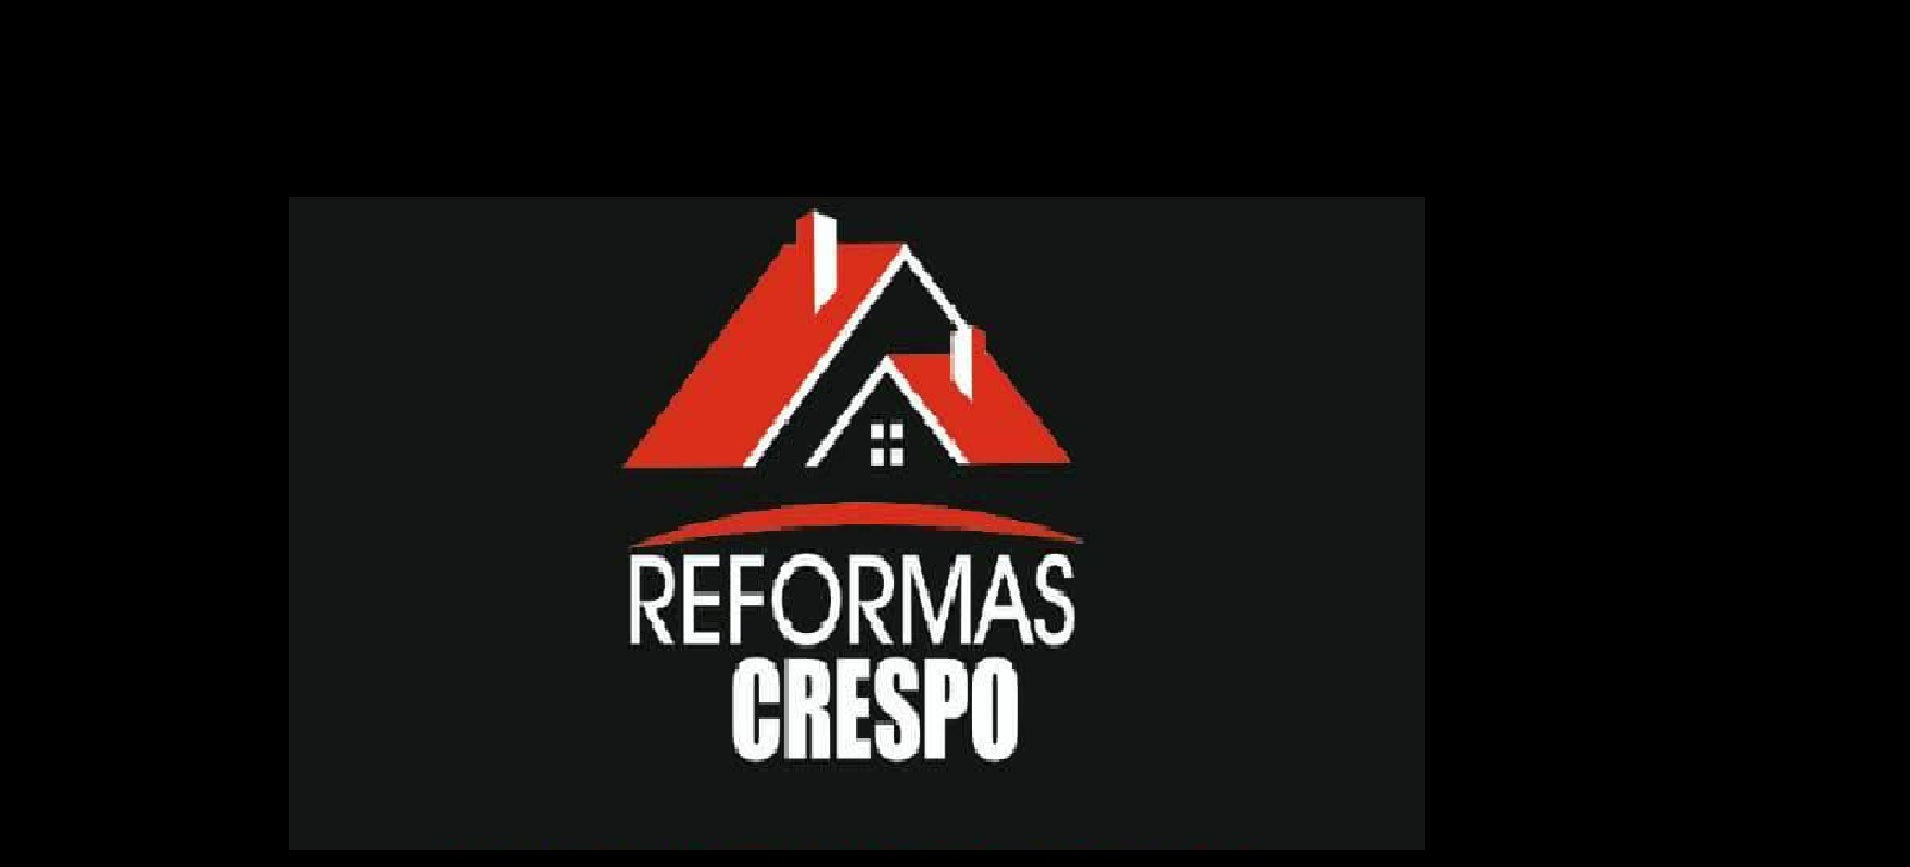 Reformas Crespo Bcn